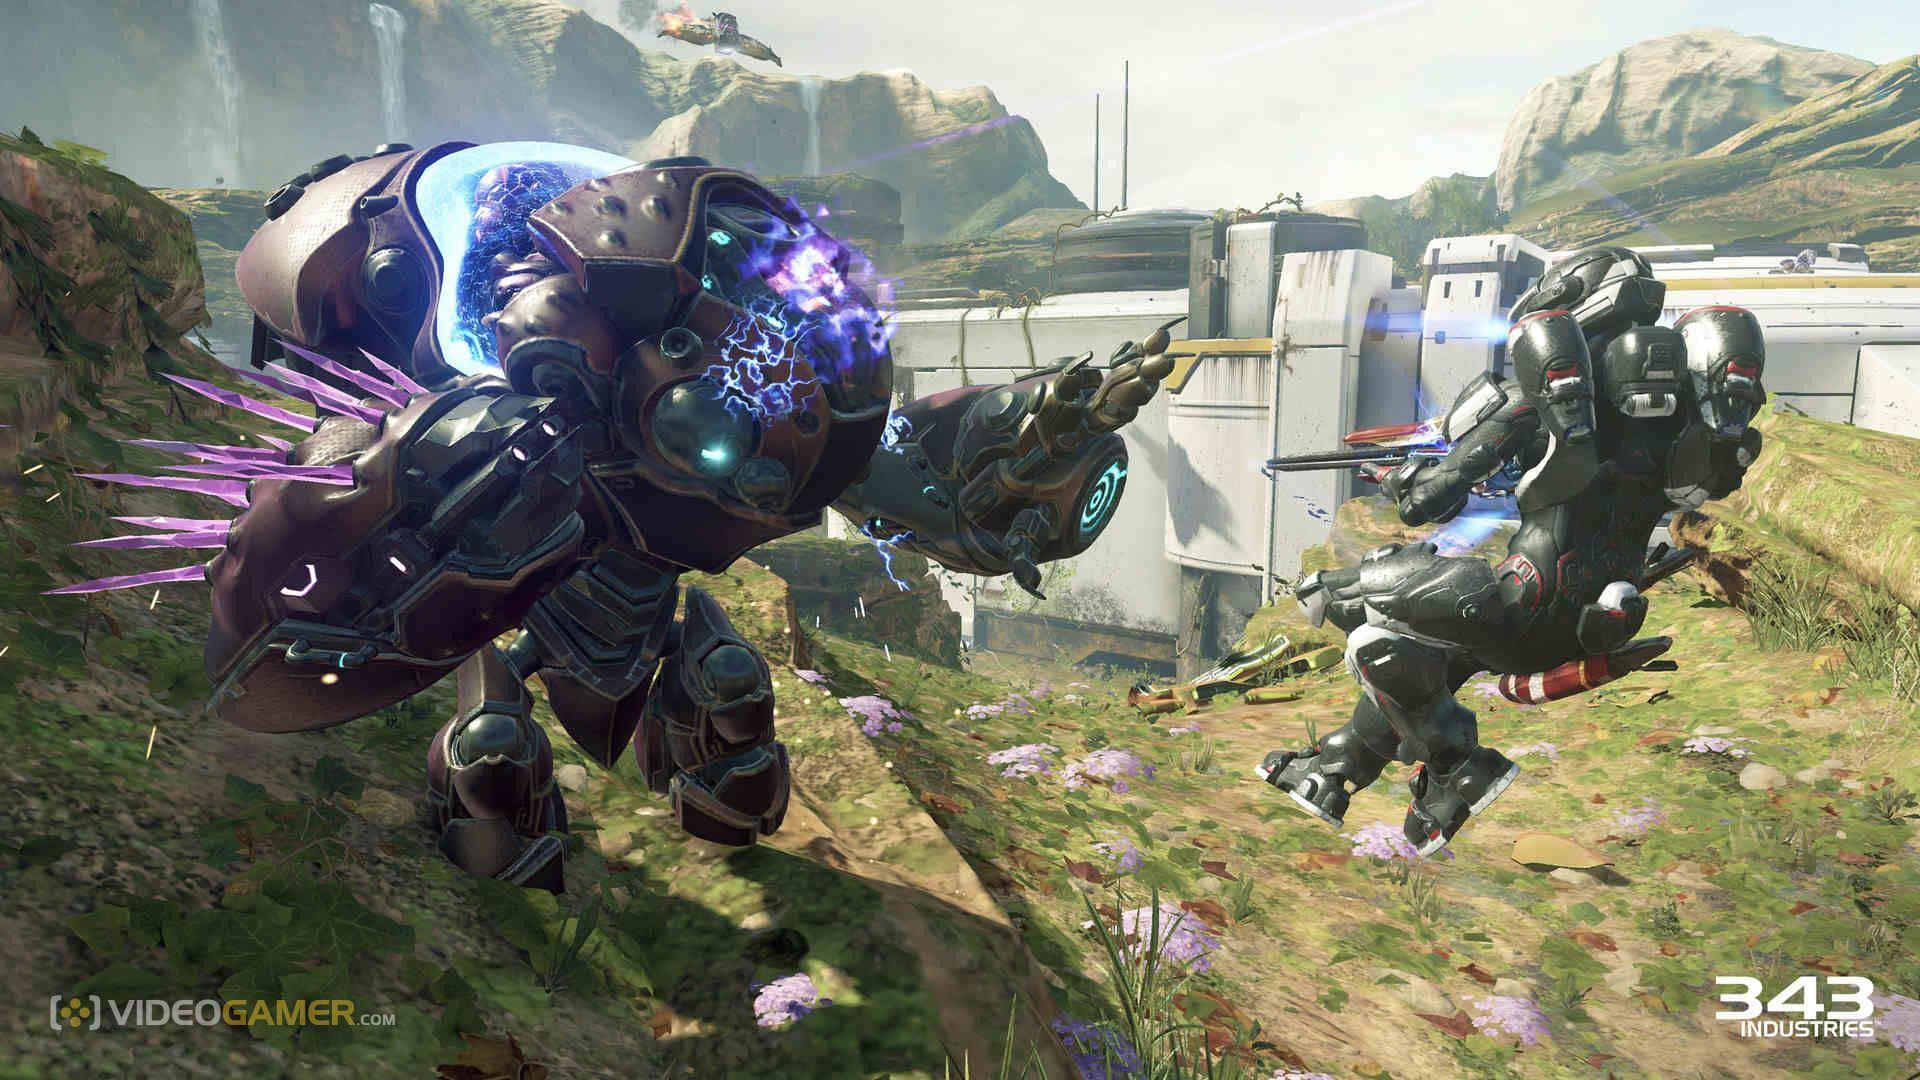 Pin by Craig Taylor on Halo Halo 5, Halo, Halo game